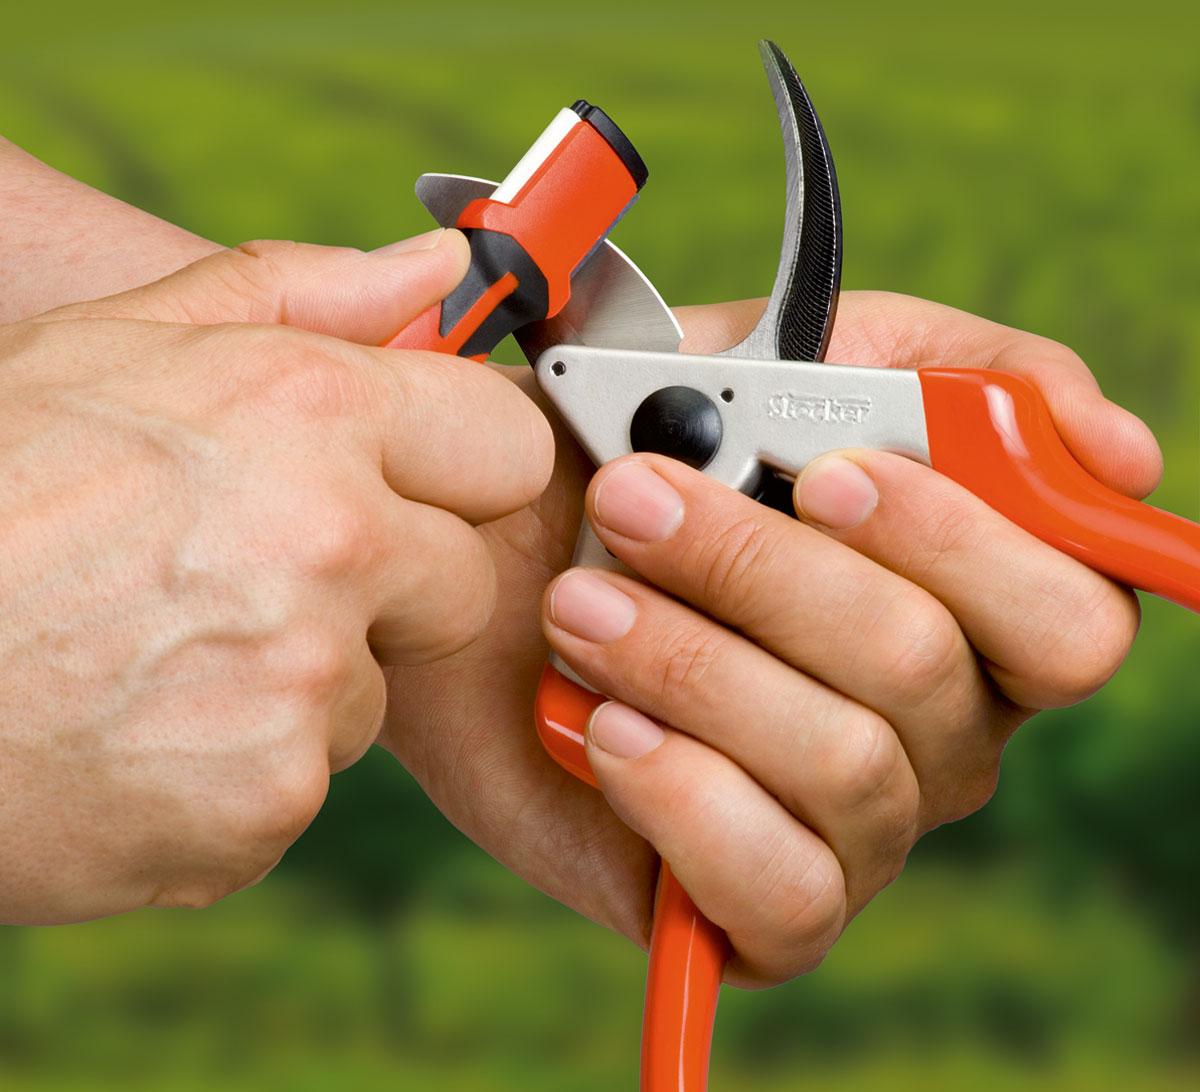 affilalame-coltelli-forbici-combi-stocker-9080